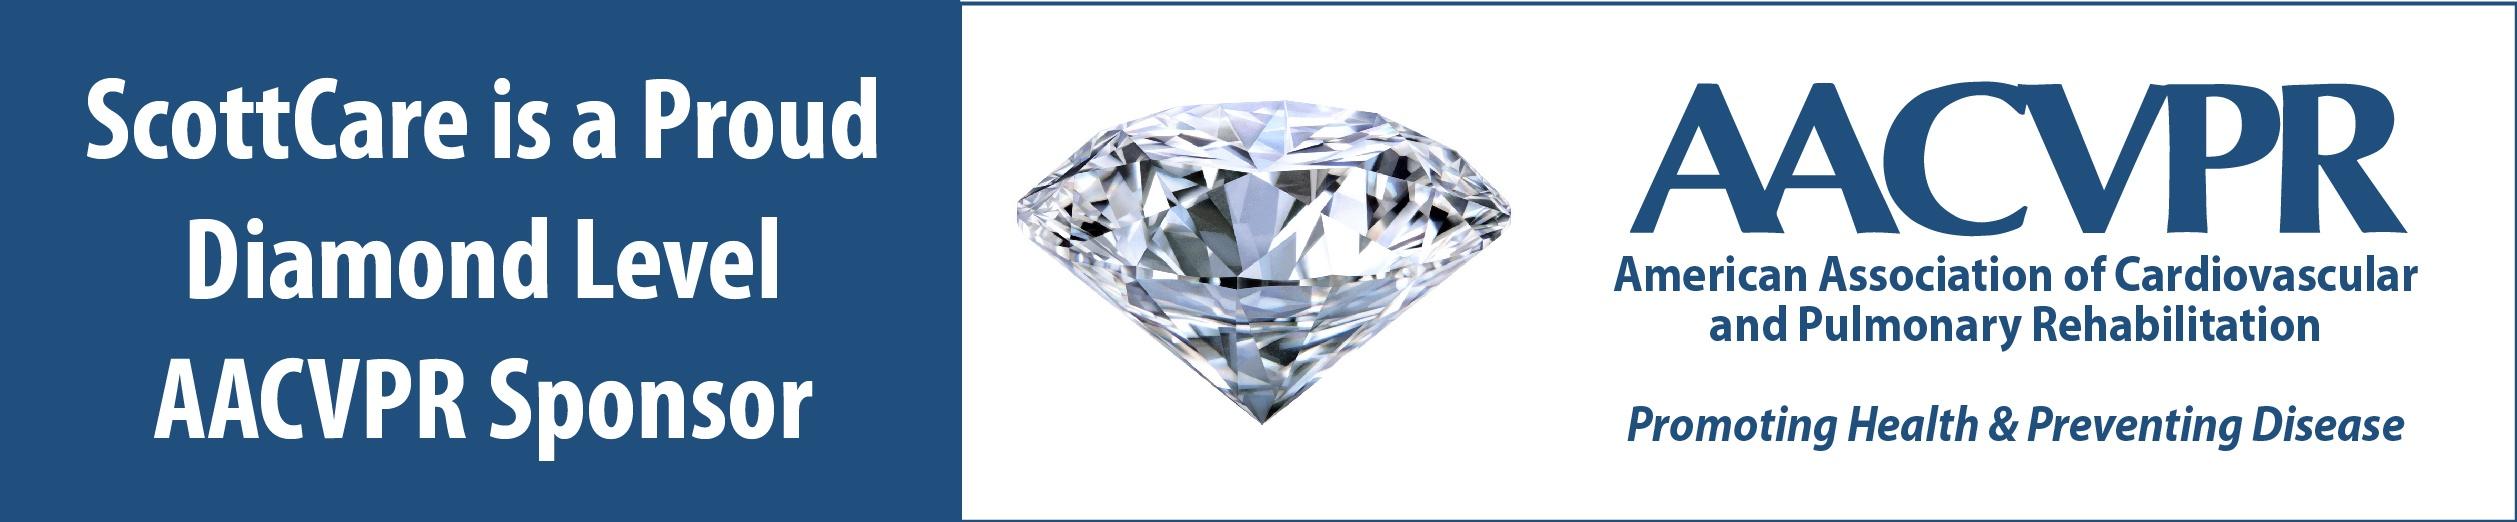 ScottCare is a Proud Diamond Level sponsor of AACVPR